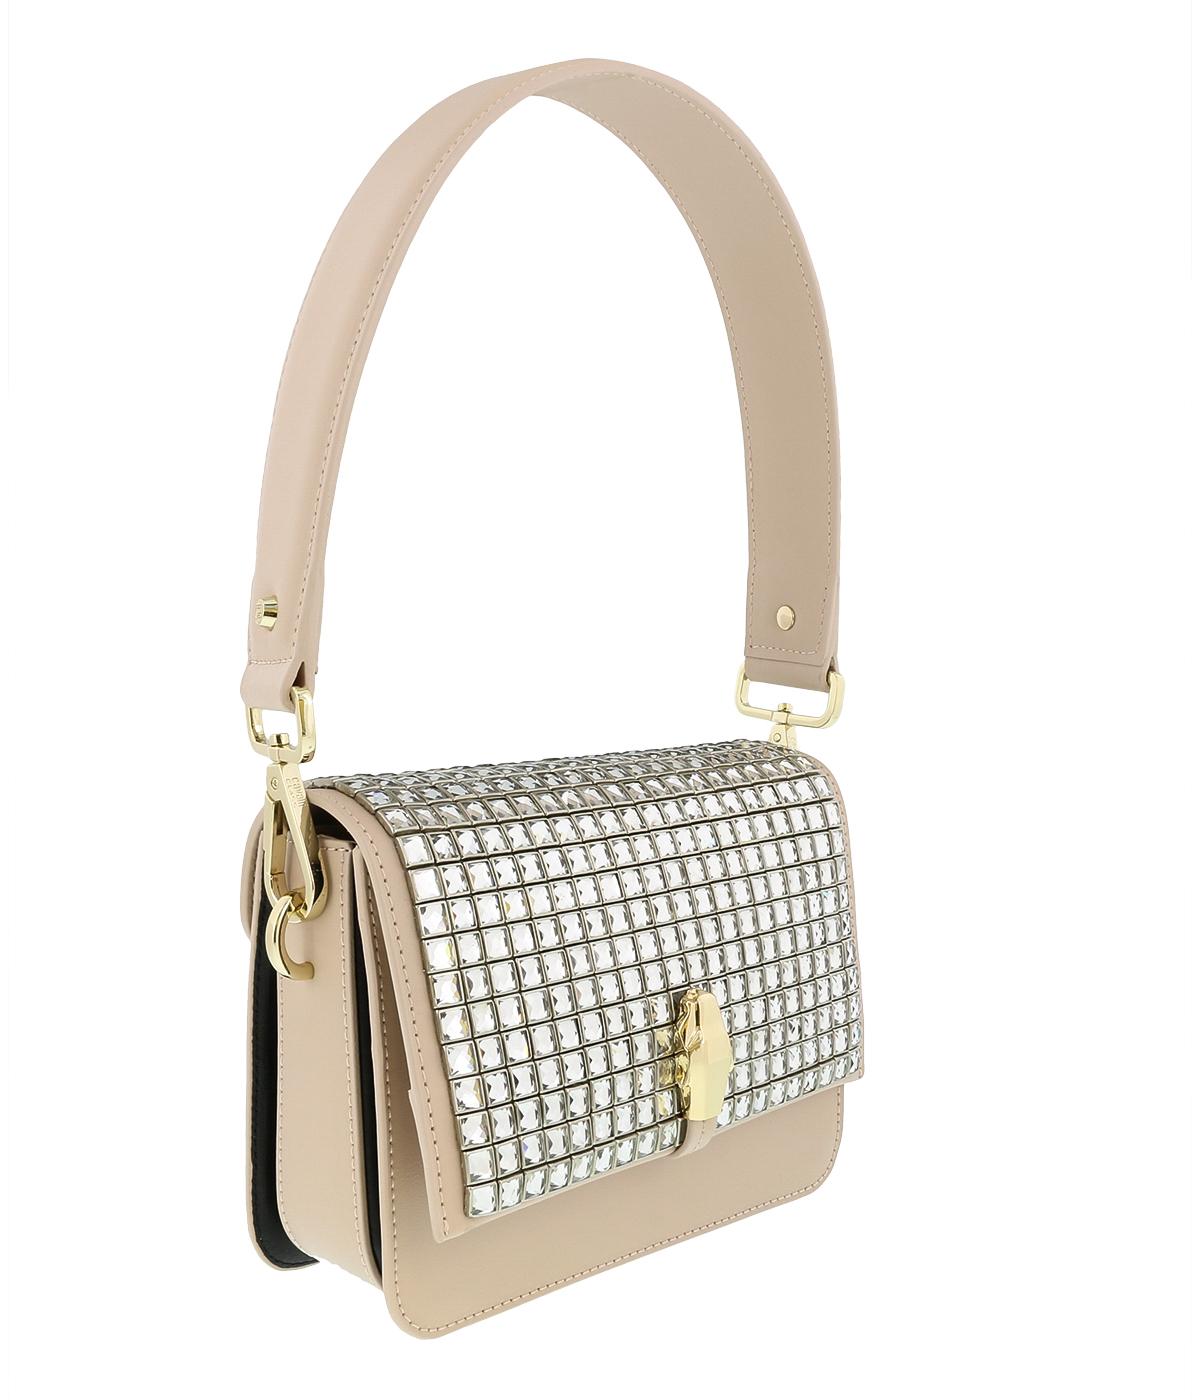 Class Roberto Cavalli Milano 008 Nude/White Medium Shoulder Bag